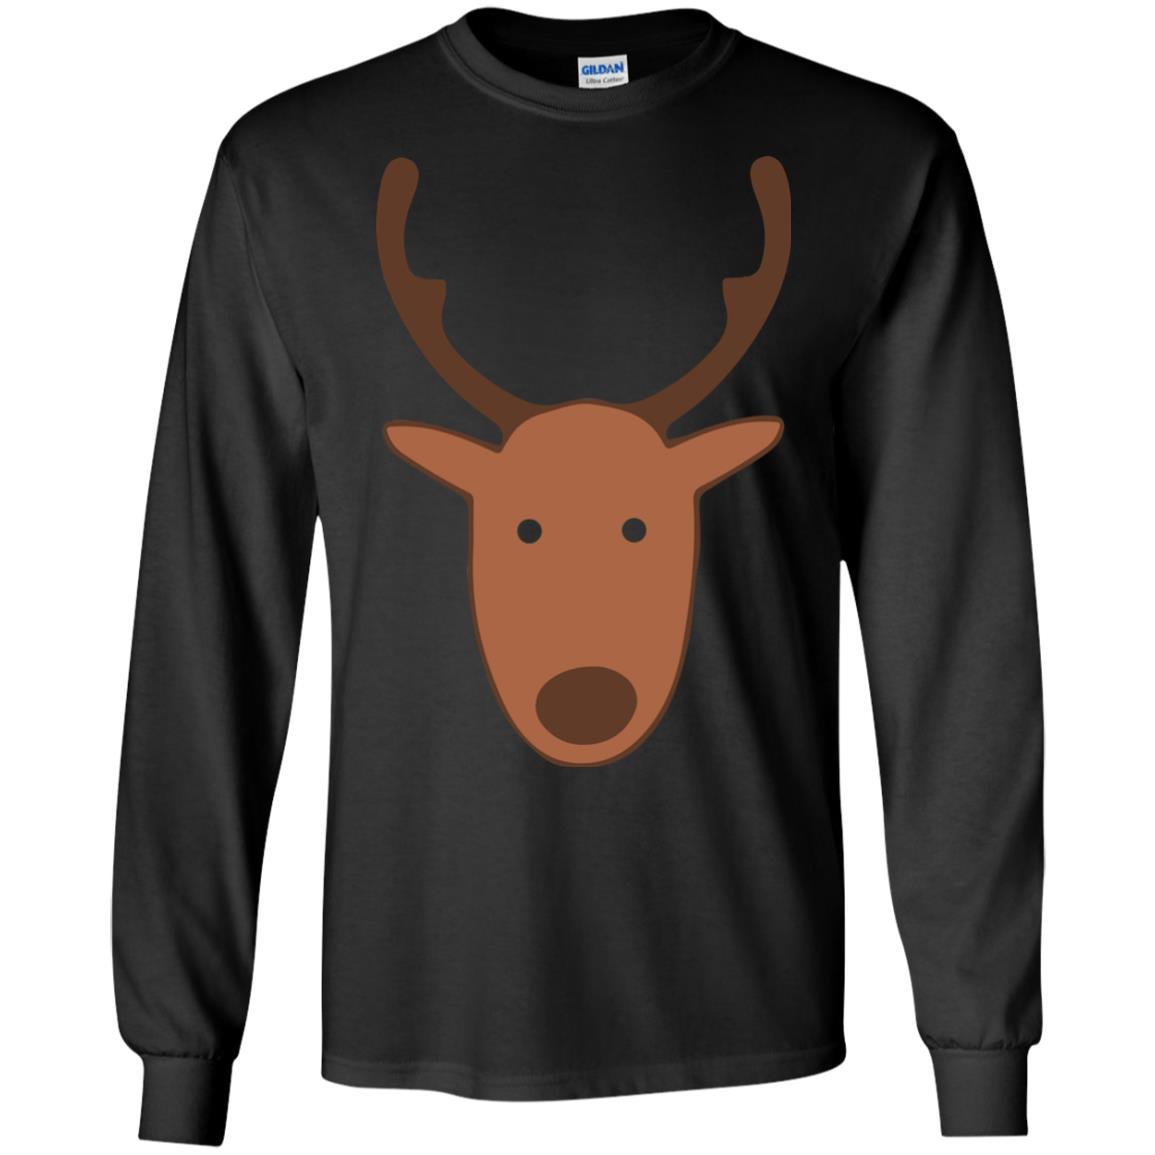 image 4767 - Tina Belcher Reindeer Christmas Sweater, Shirt, Hoodie